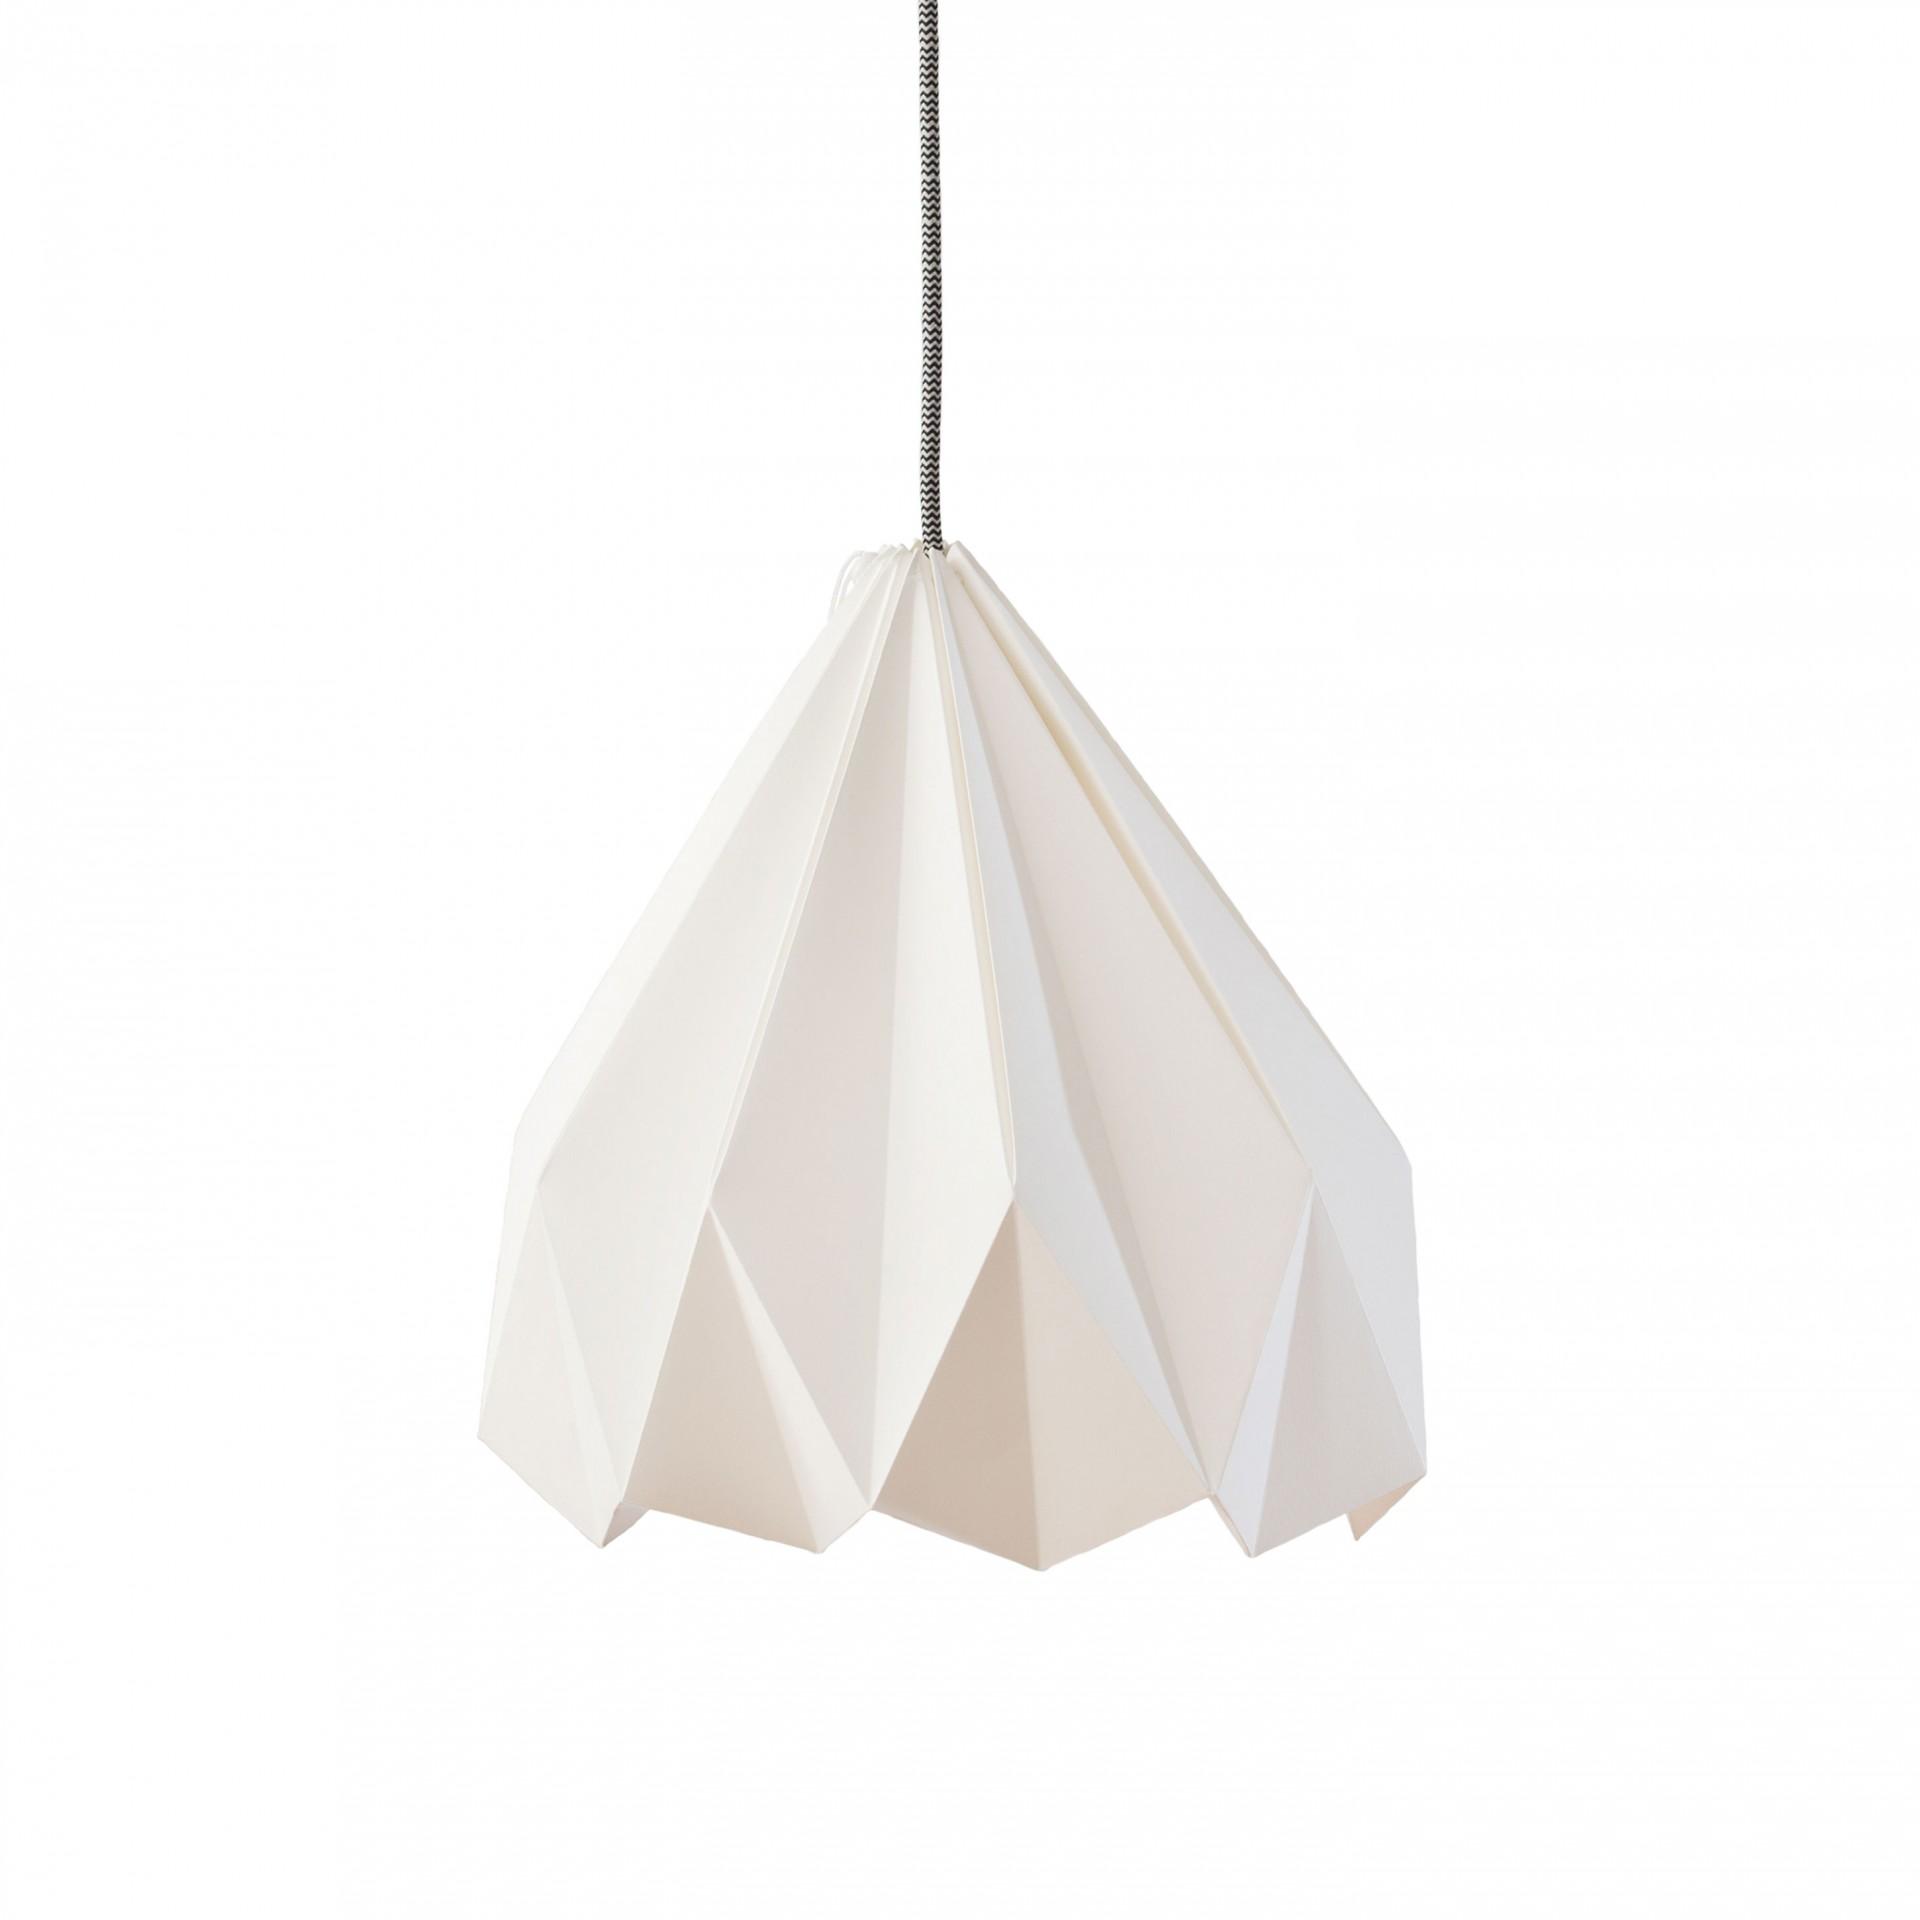 Abajur de papel Origâmi, modelo Lusco, branco